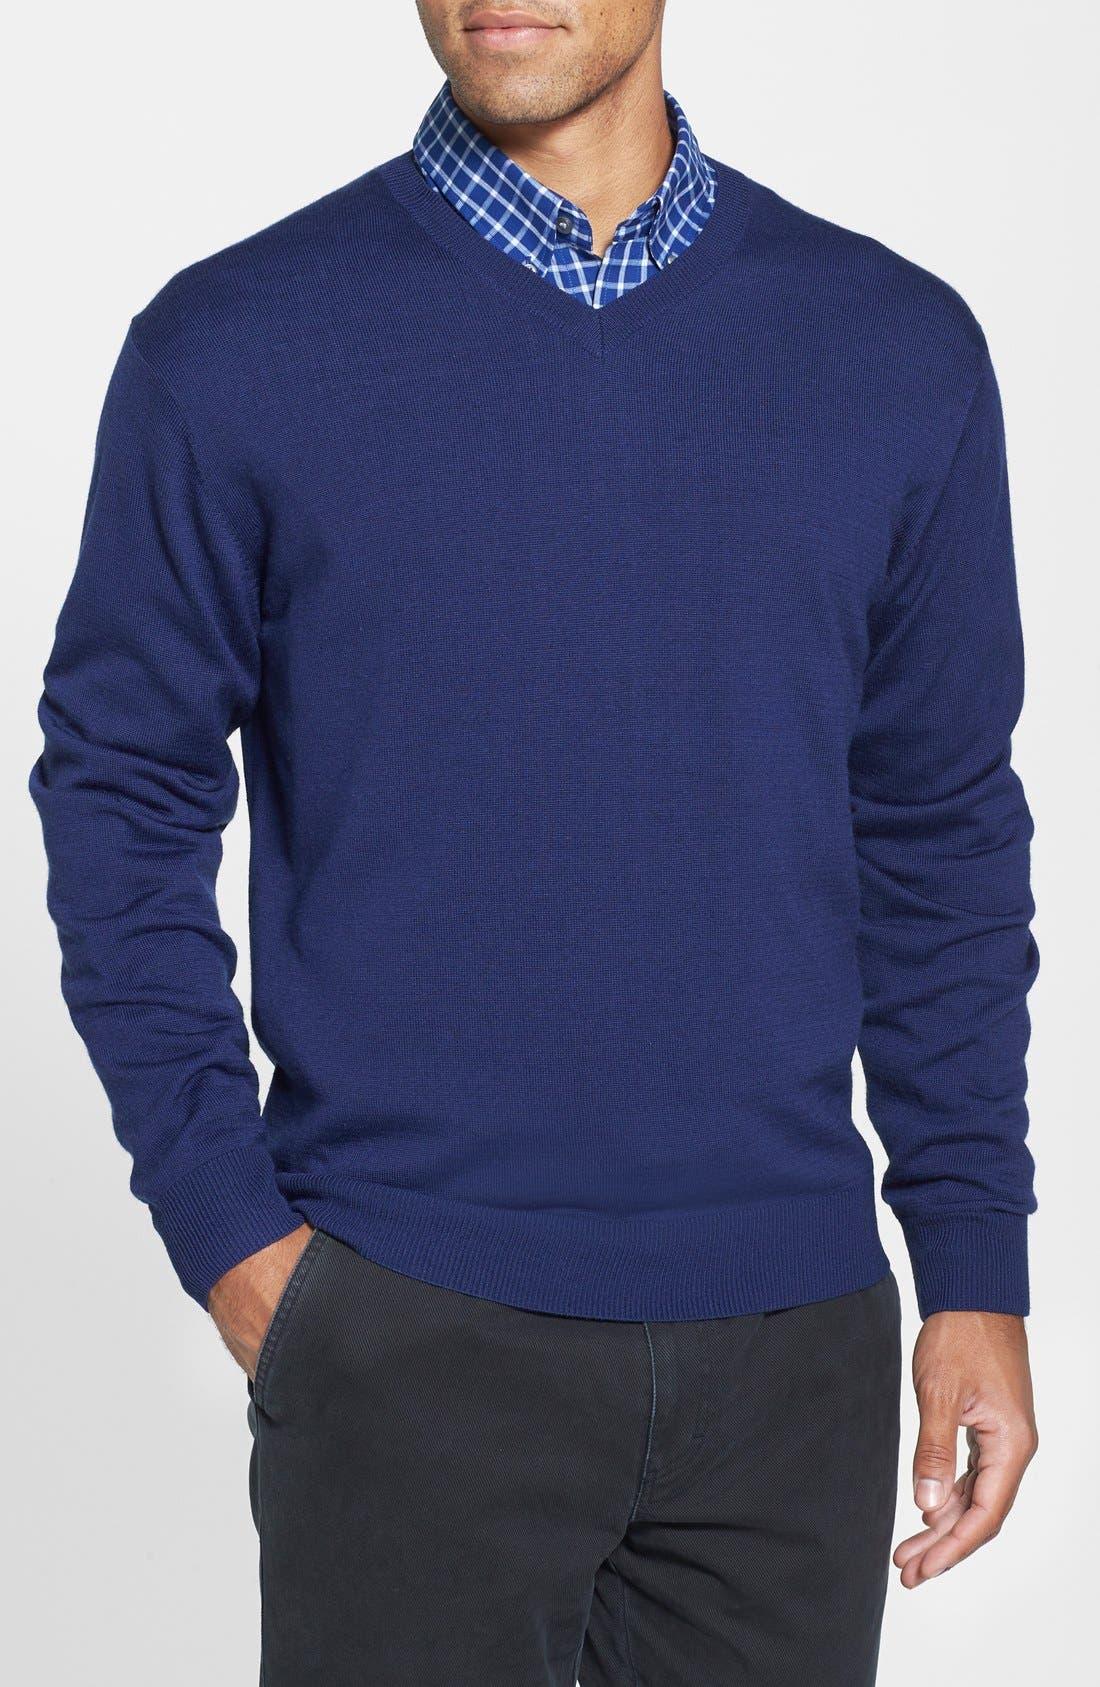 Douglas V-Neck Sweater